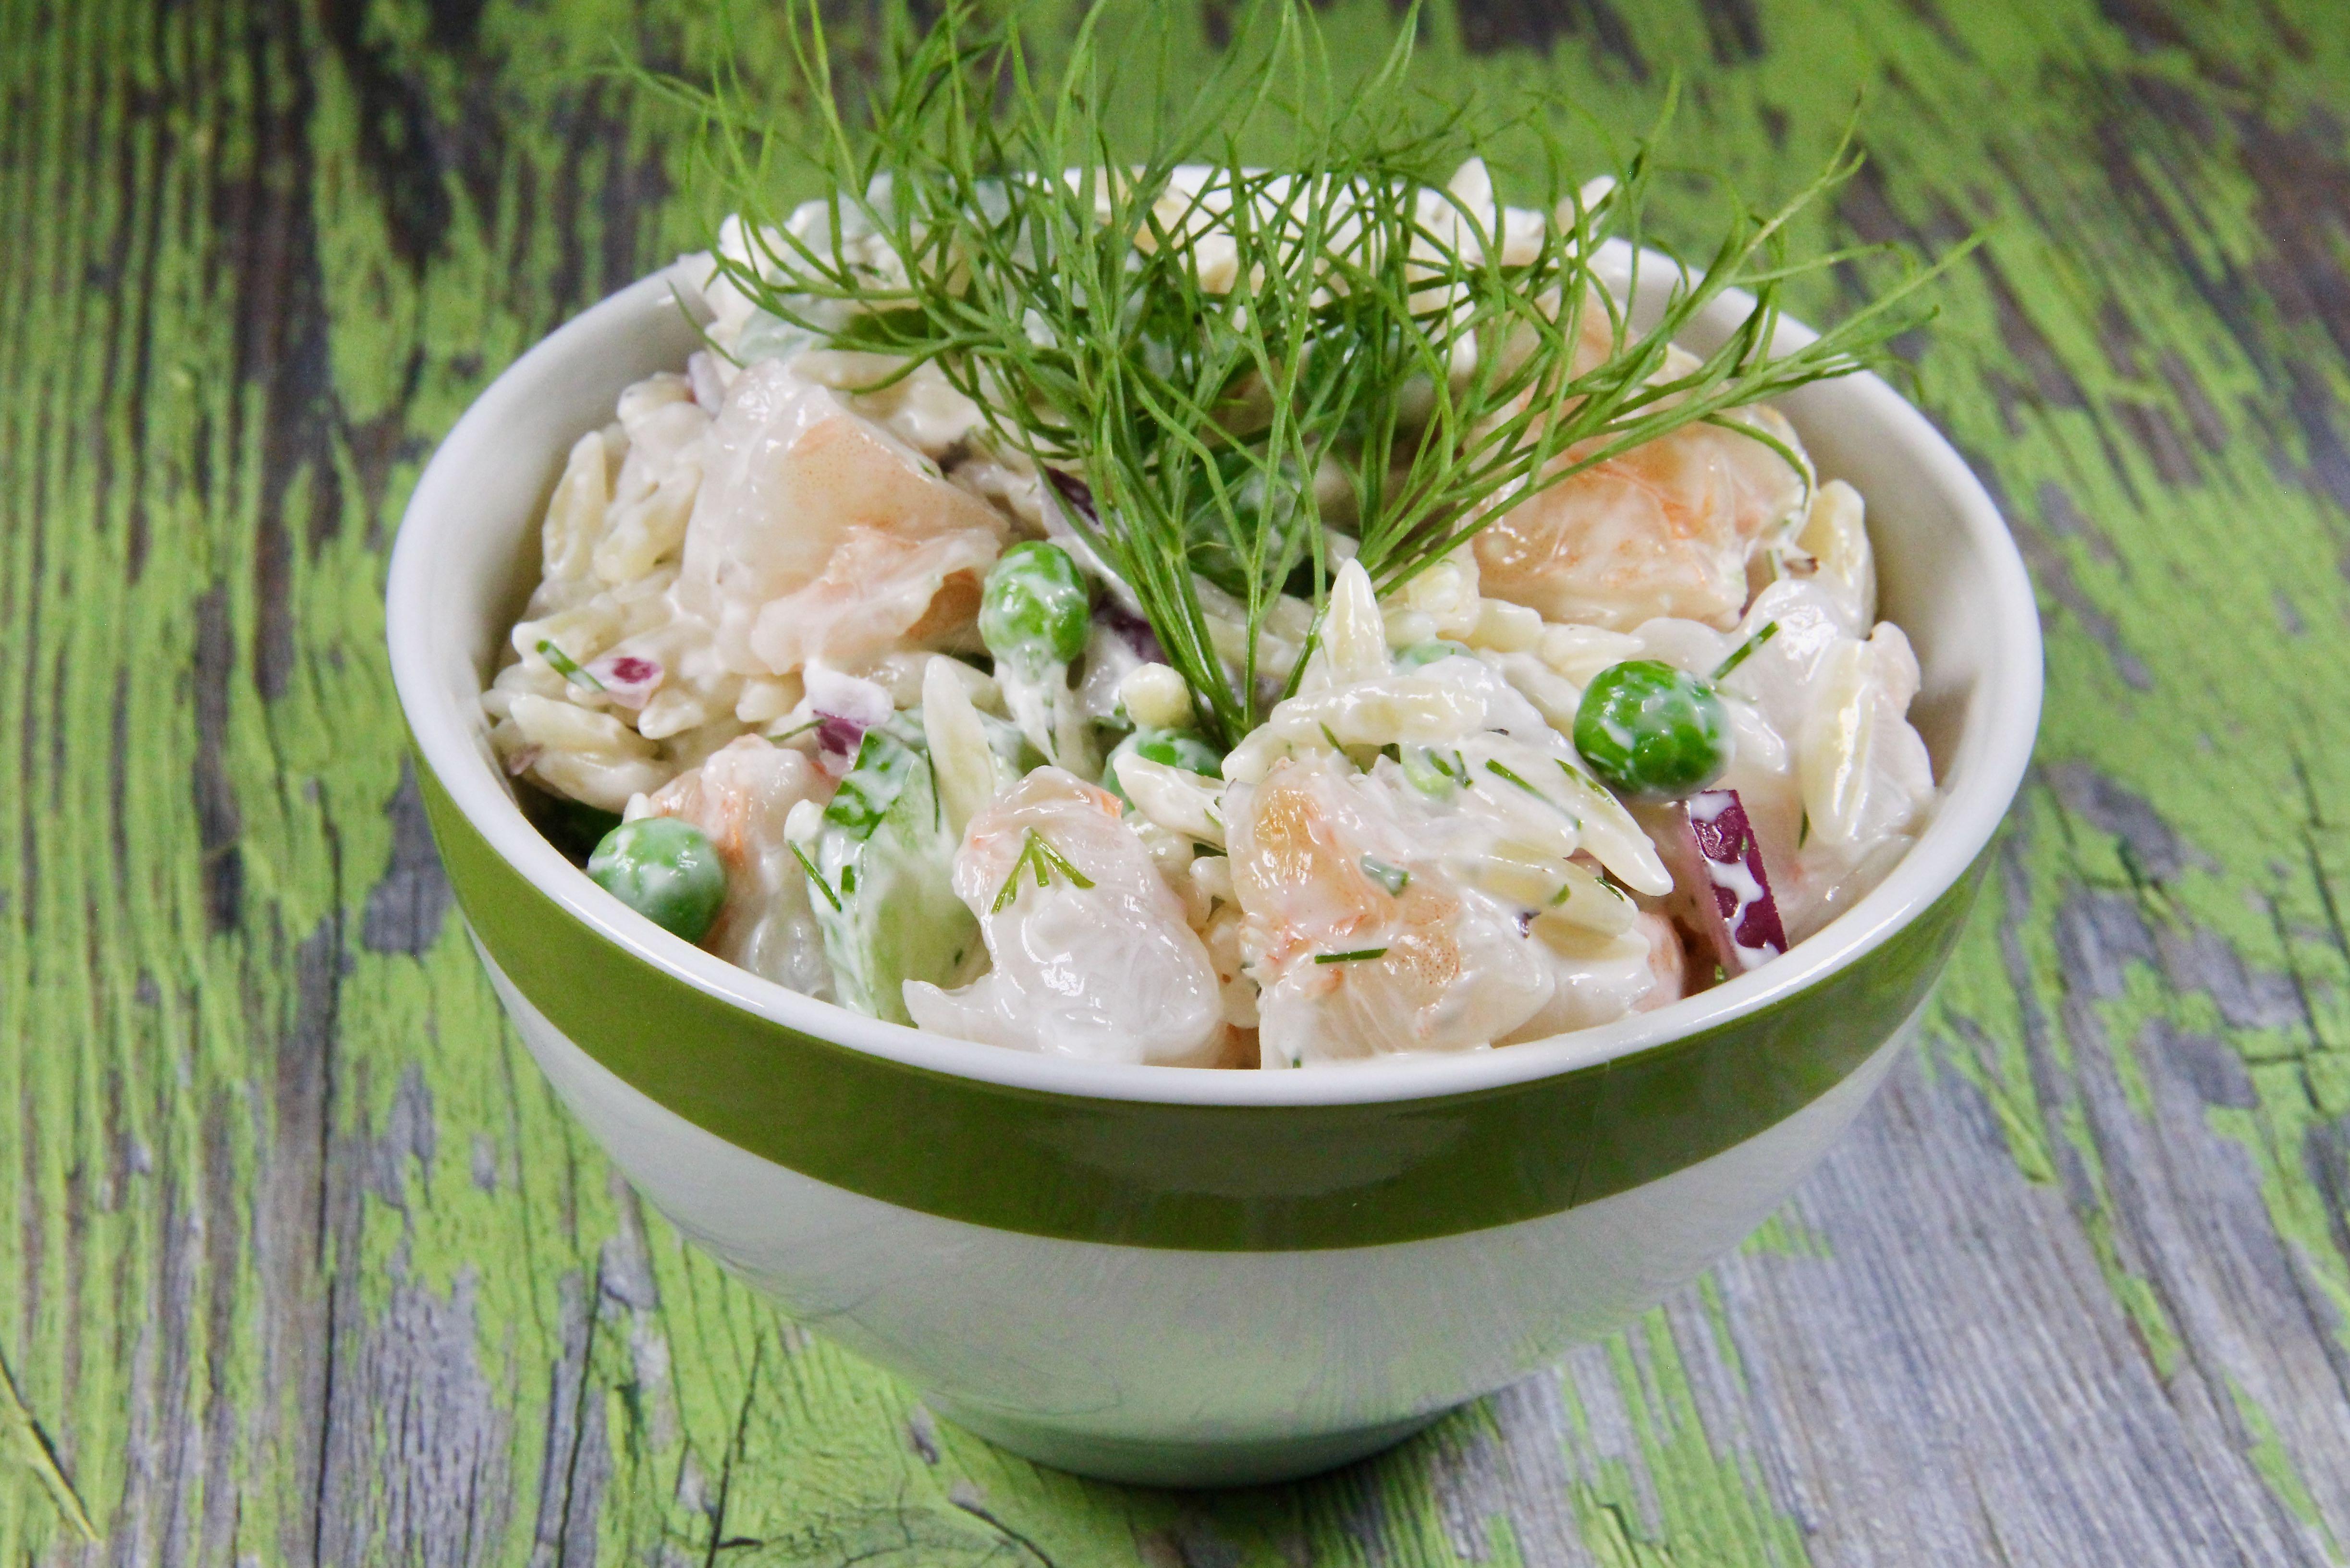 Shrimp Pasta Salad With Dill